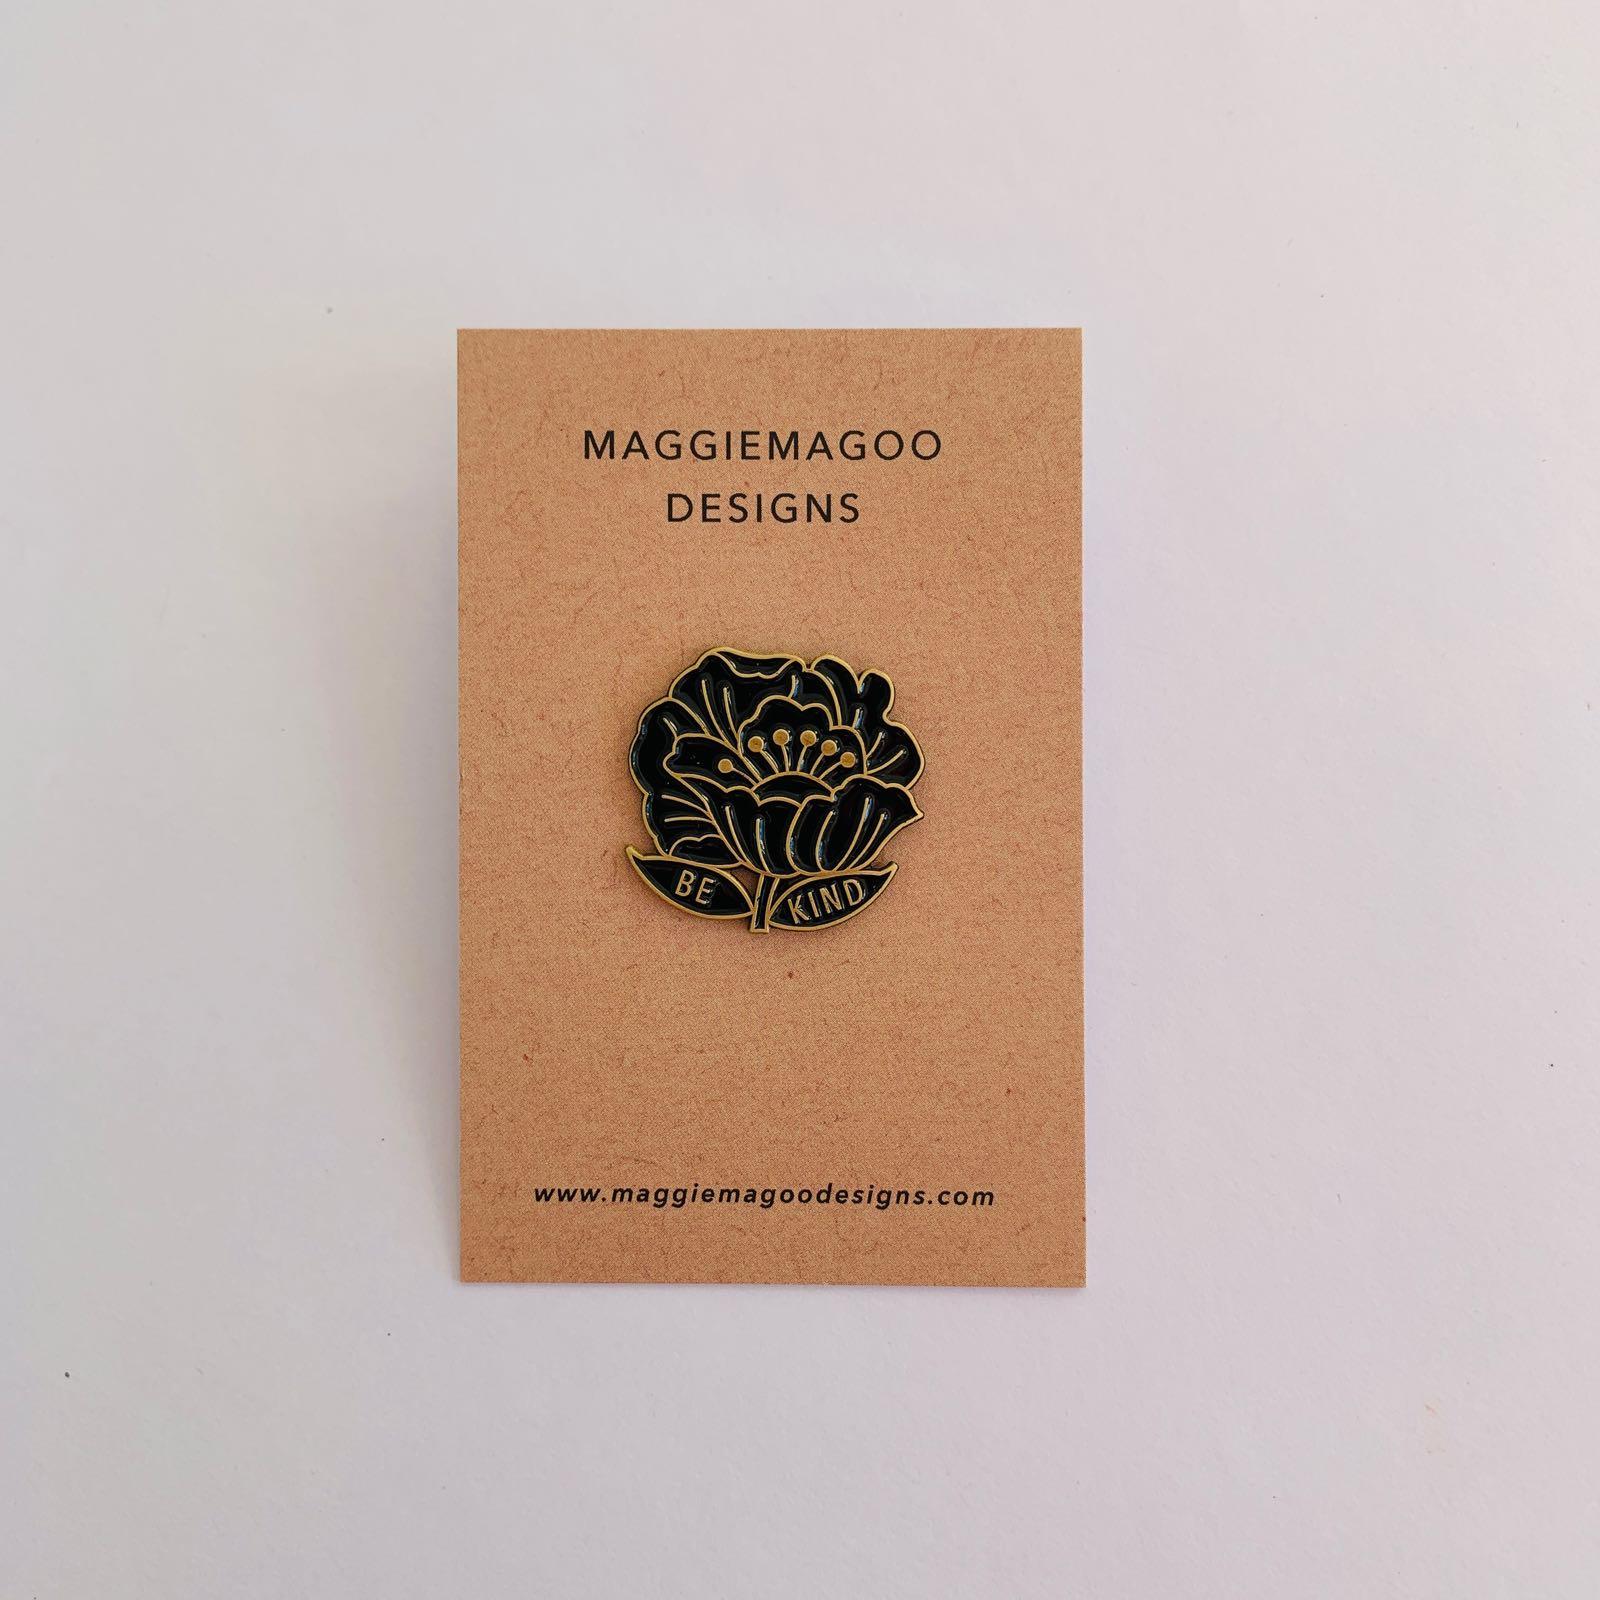 MaggieMagoo Designs - 'Be Kind' Pin Badge